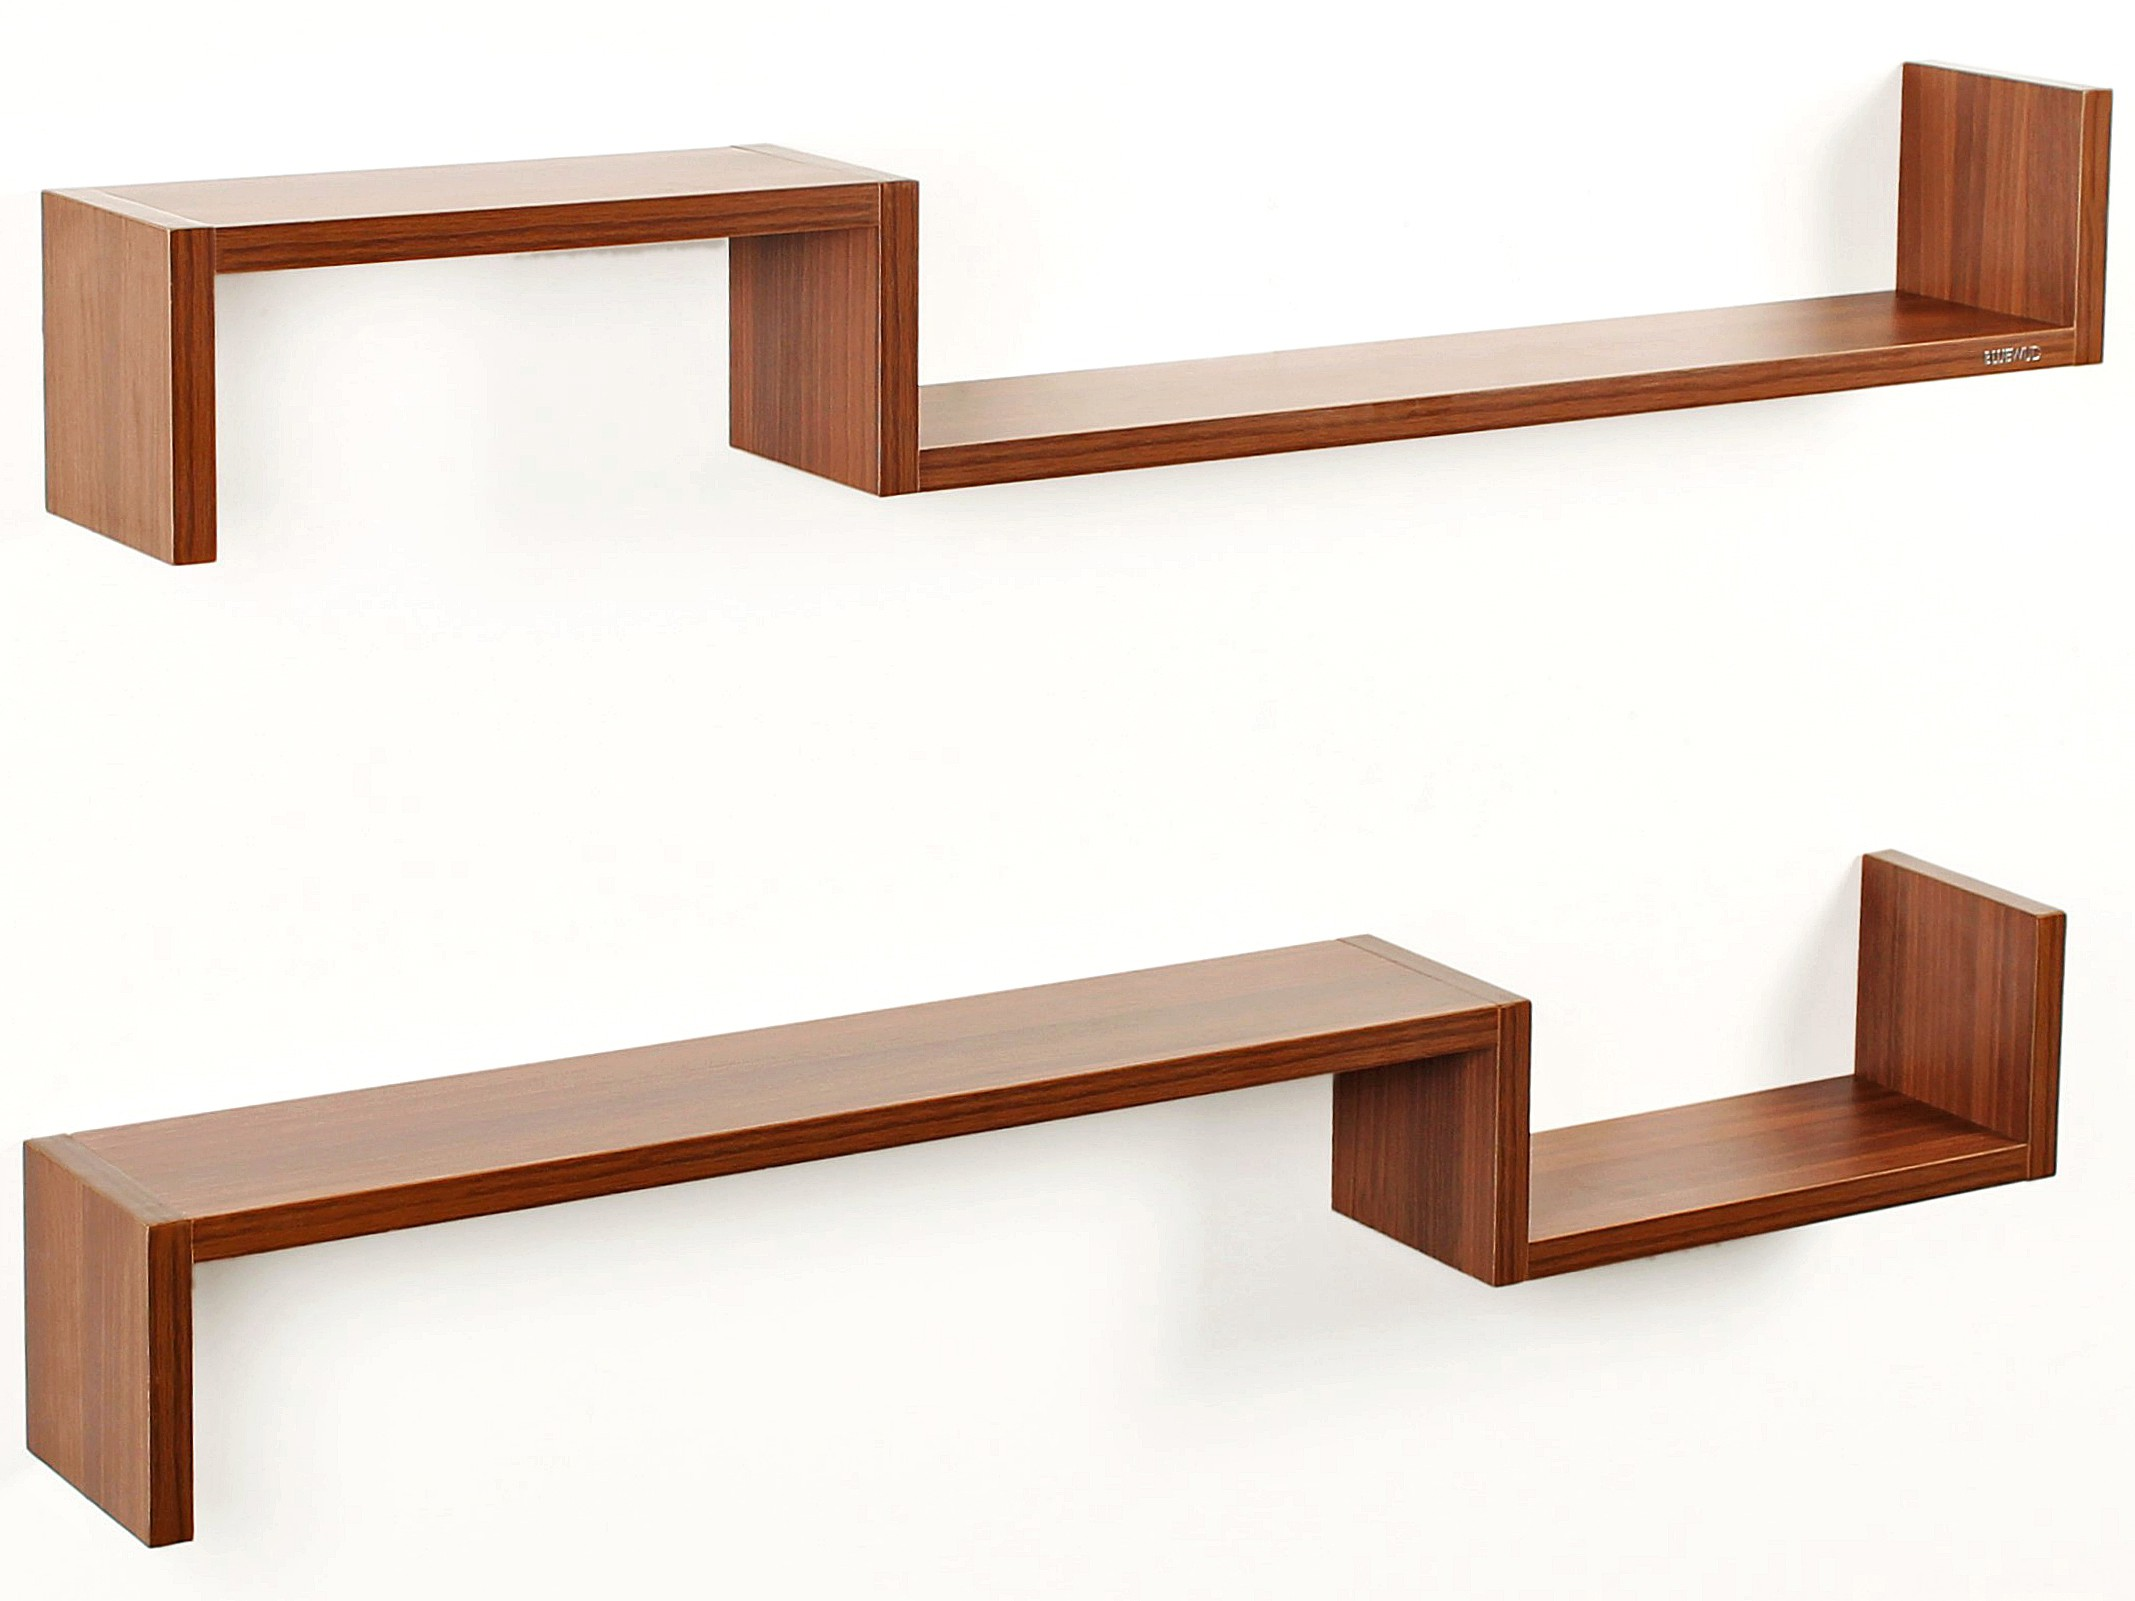 View Bluewud Riley Engineered Wood Open Book Shelf(Finish Color - Walnut) Furniture (Bluewud)